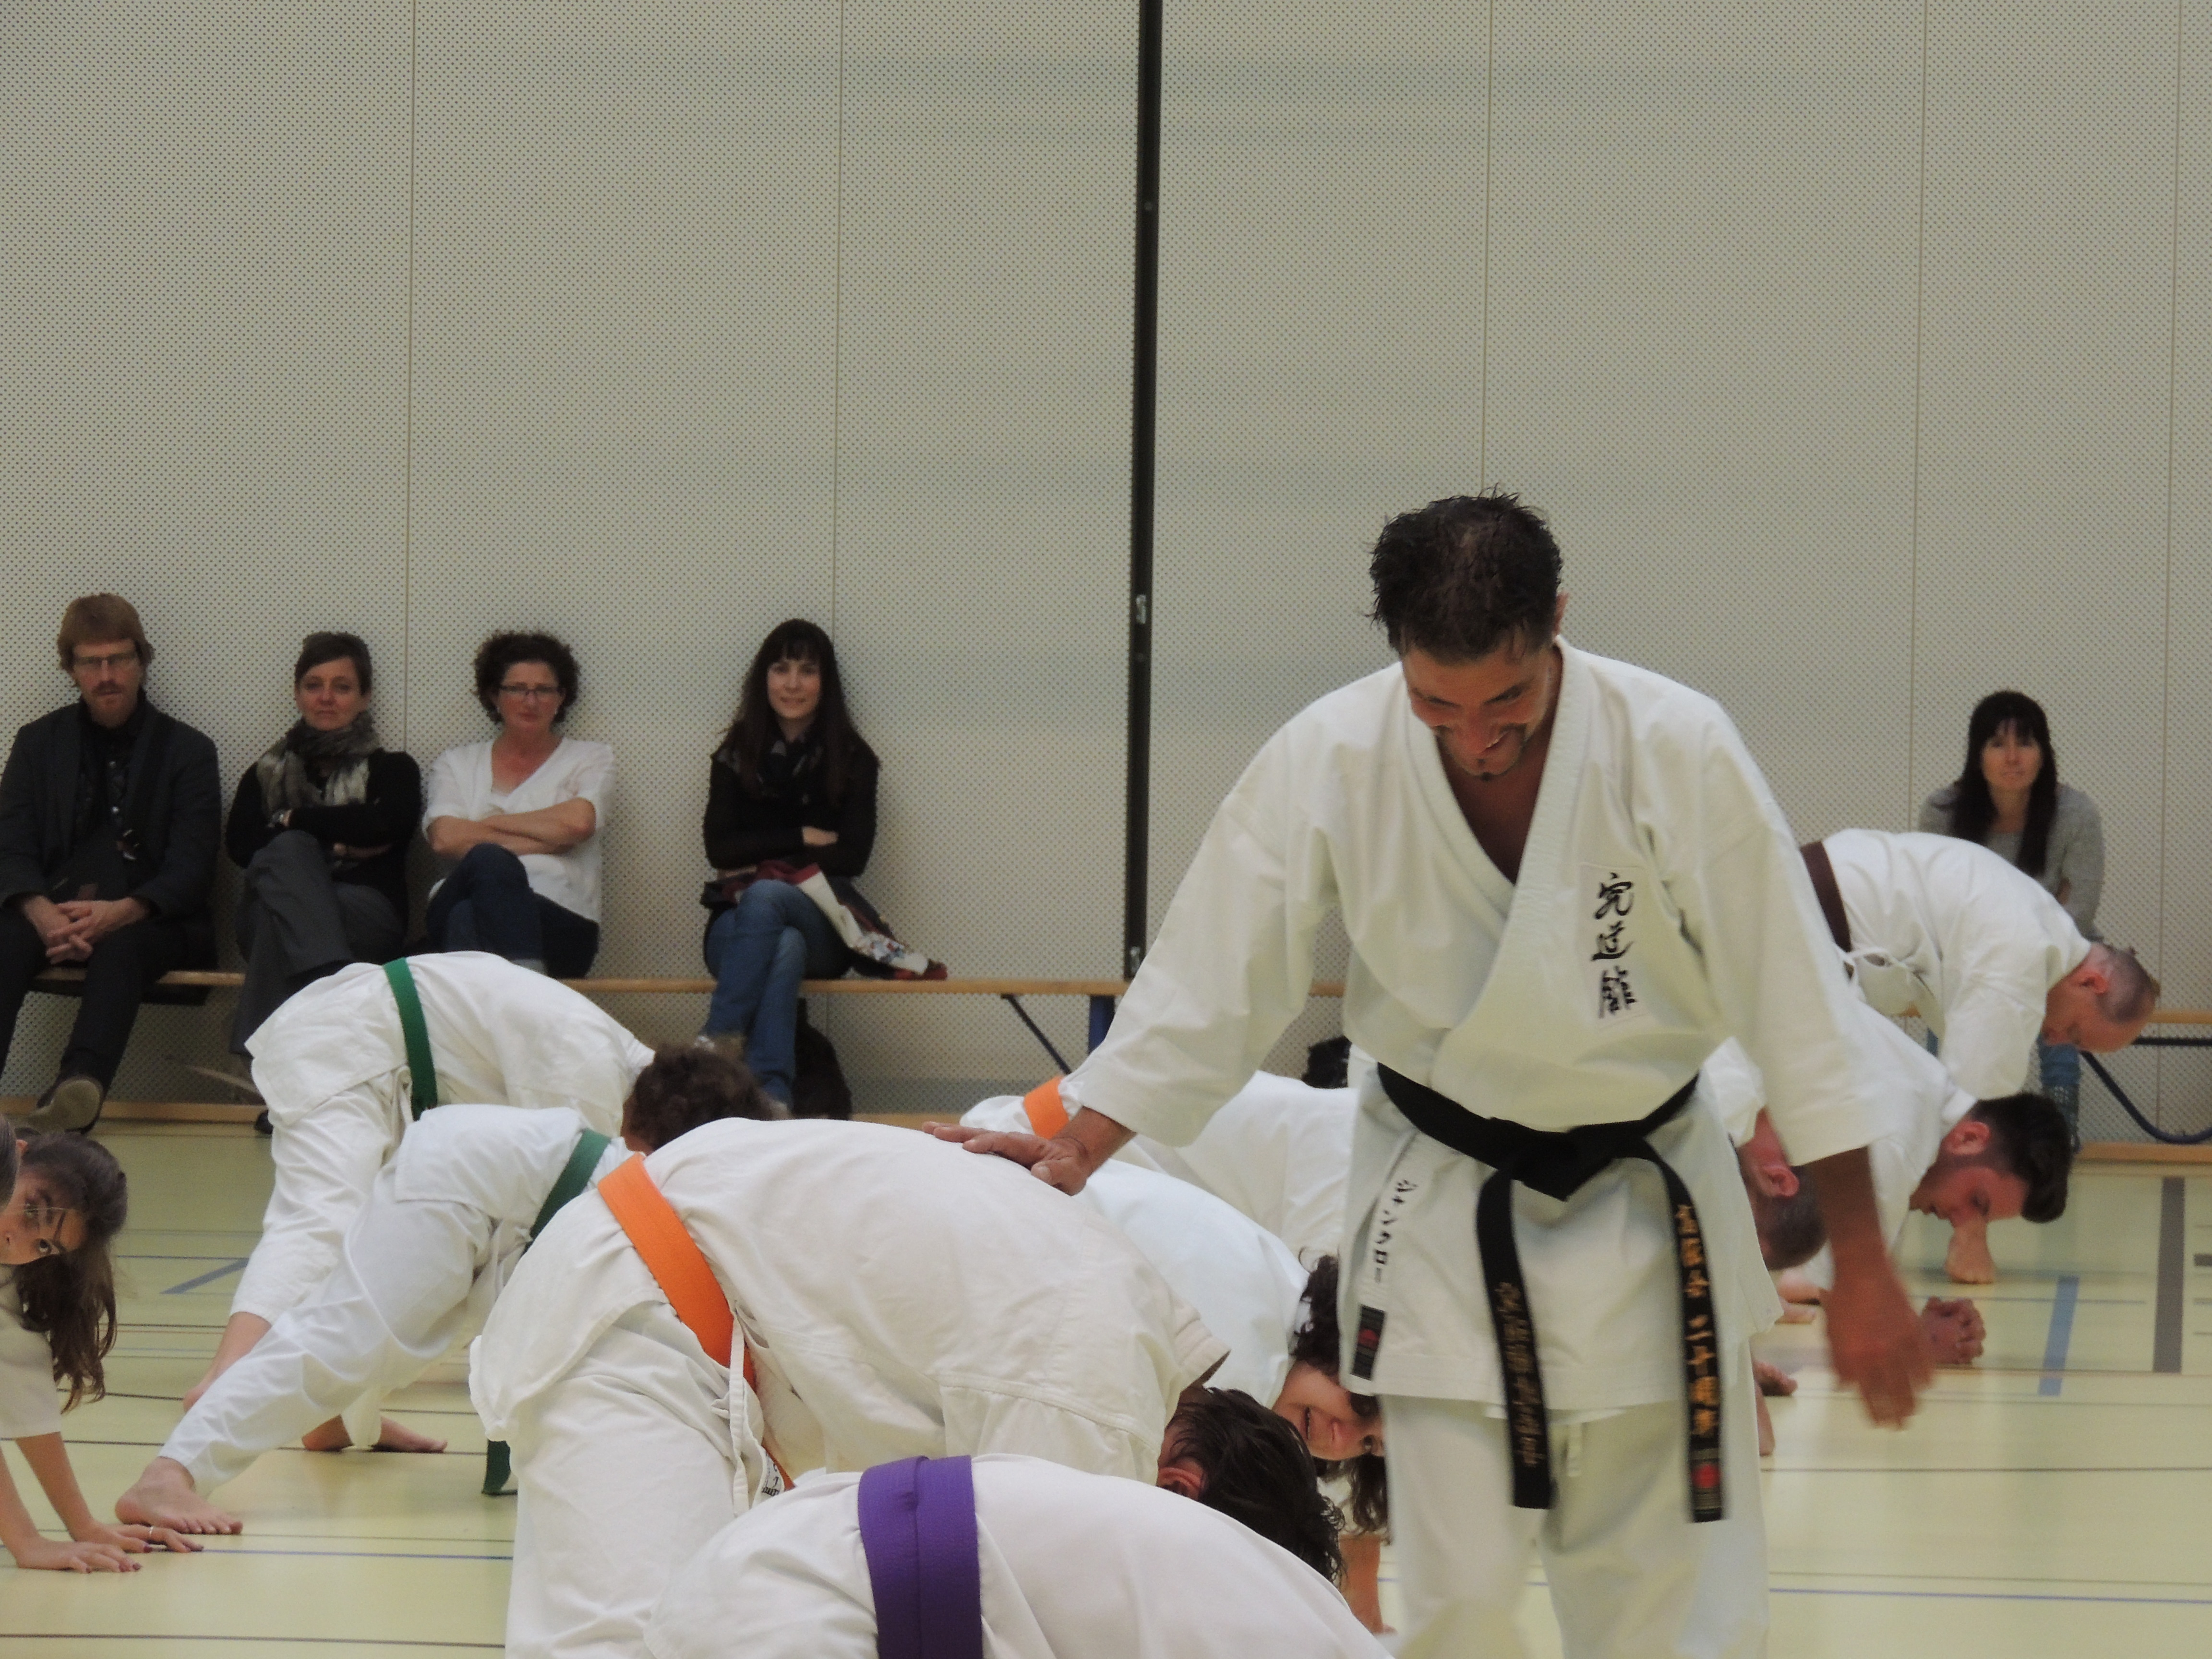 Kodenkai Karate Club Valais z8